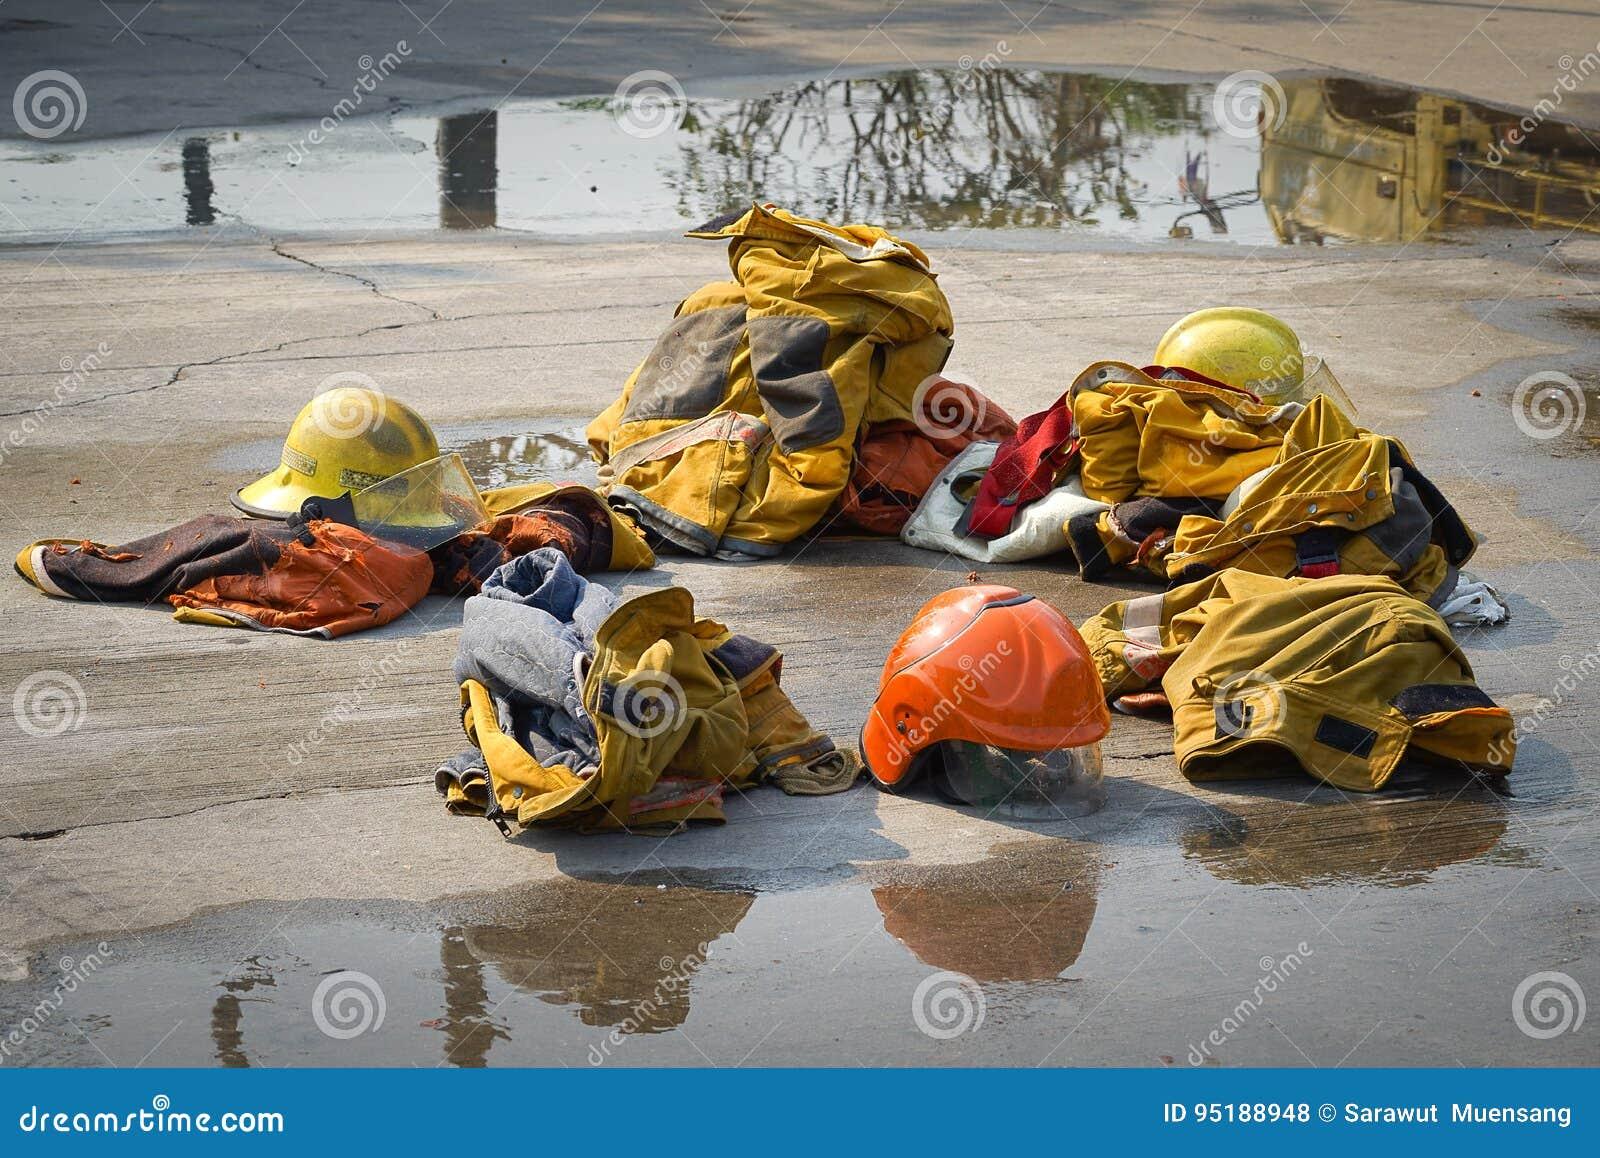 Fireman. Firefighters training.